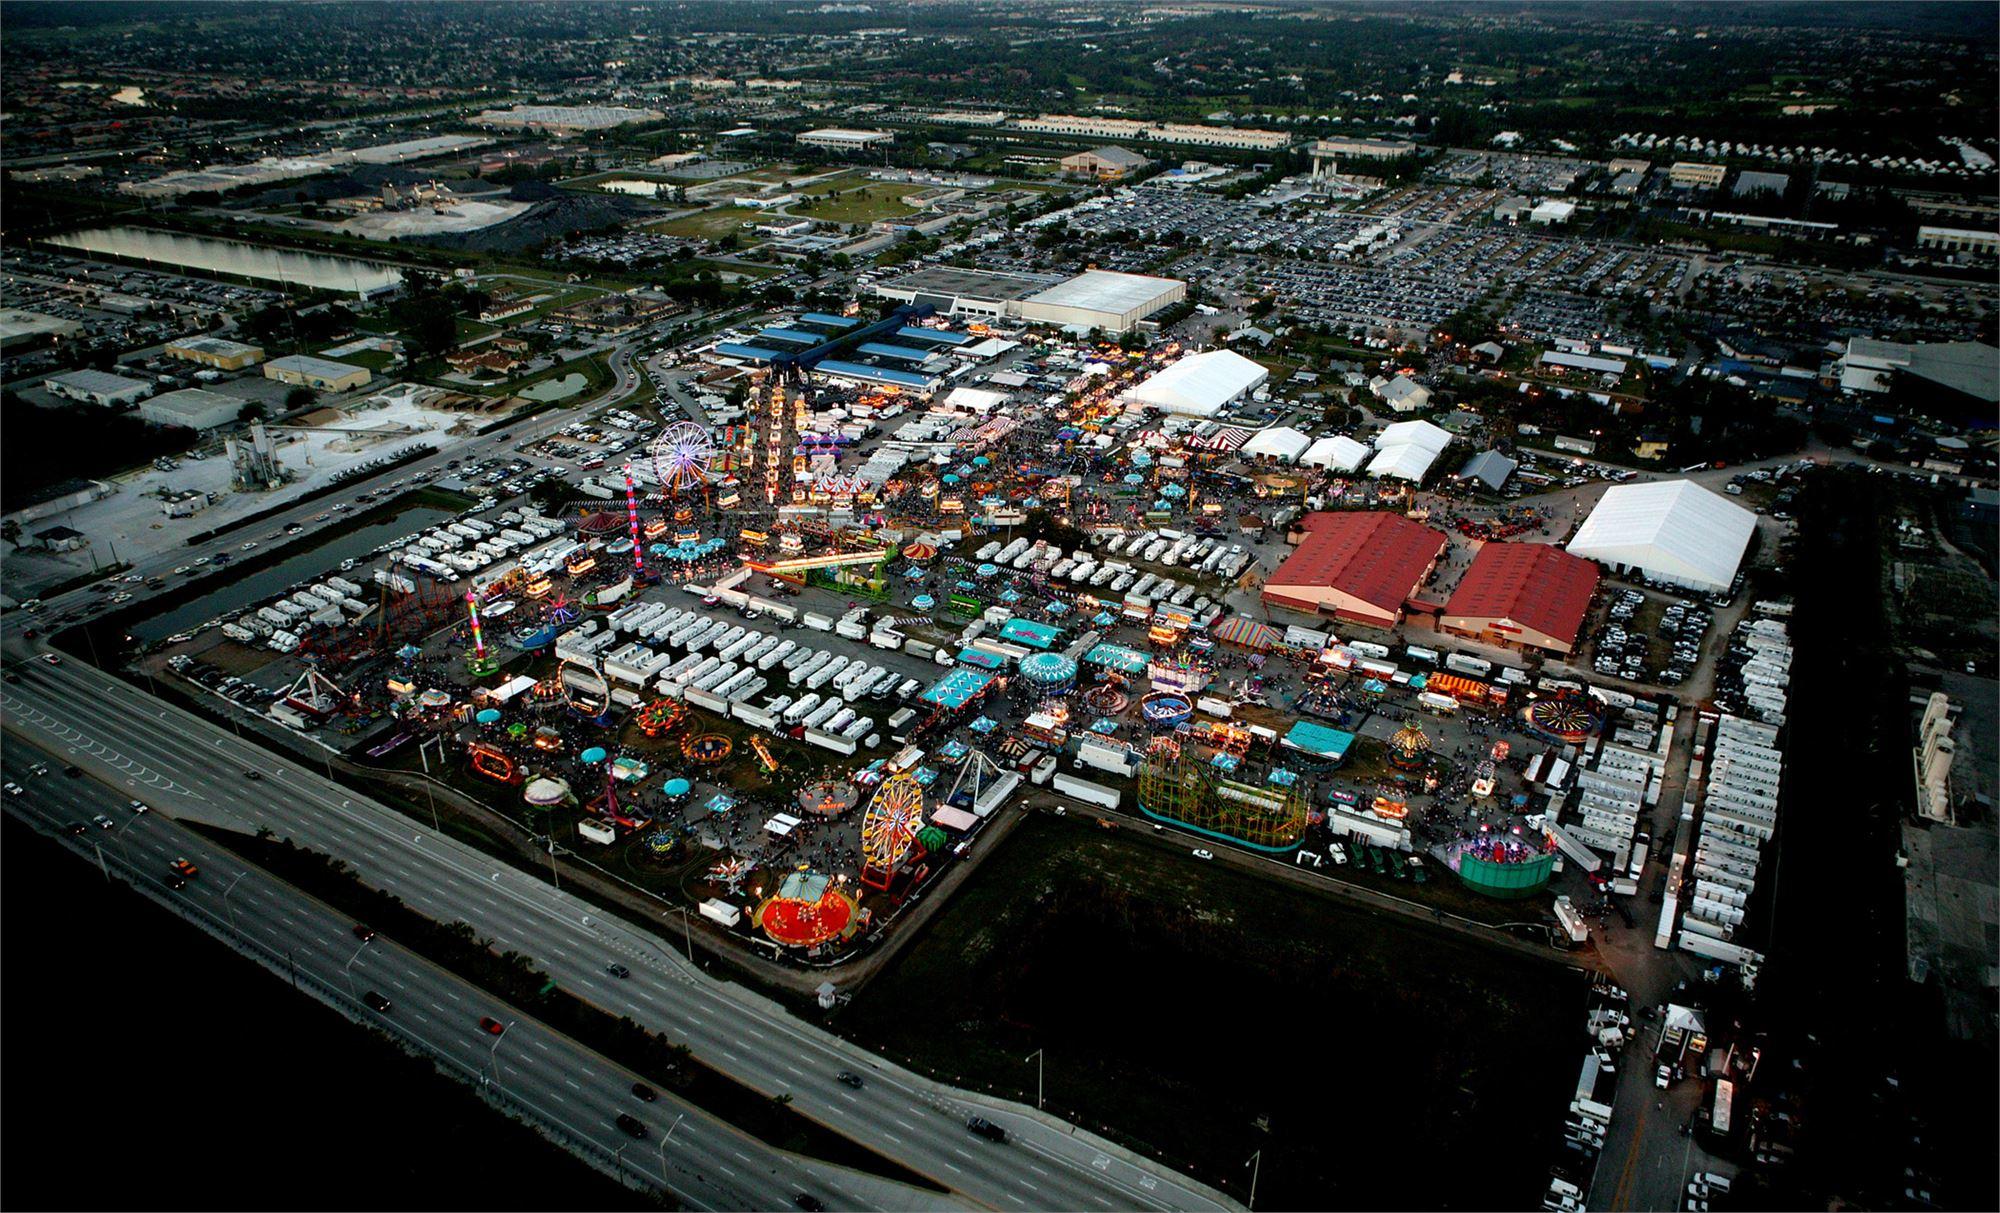 South Florida Fair   West Palm Beach, Fl   561.793.0333 Regarding South Florida Fairgrounds Events 2021